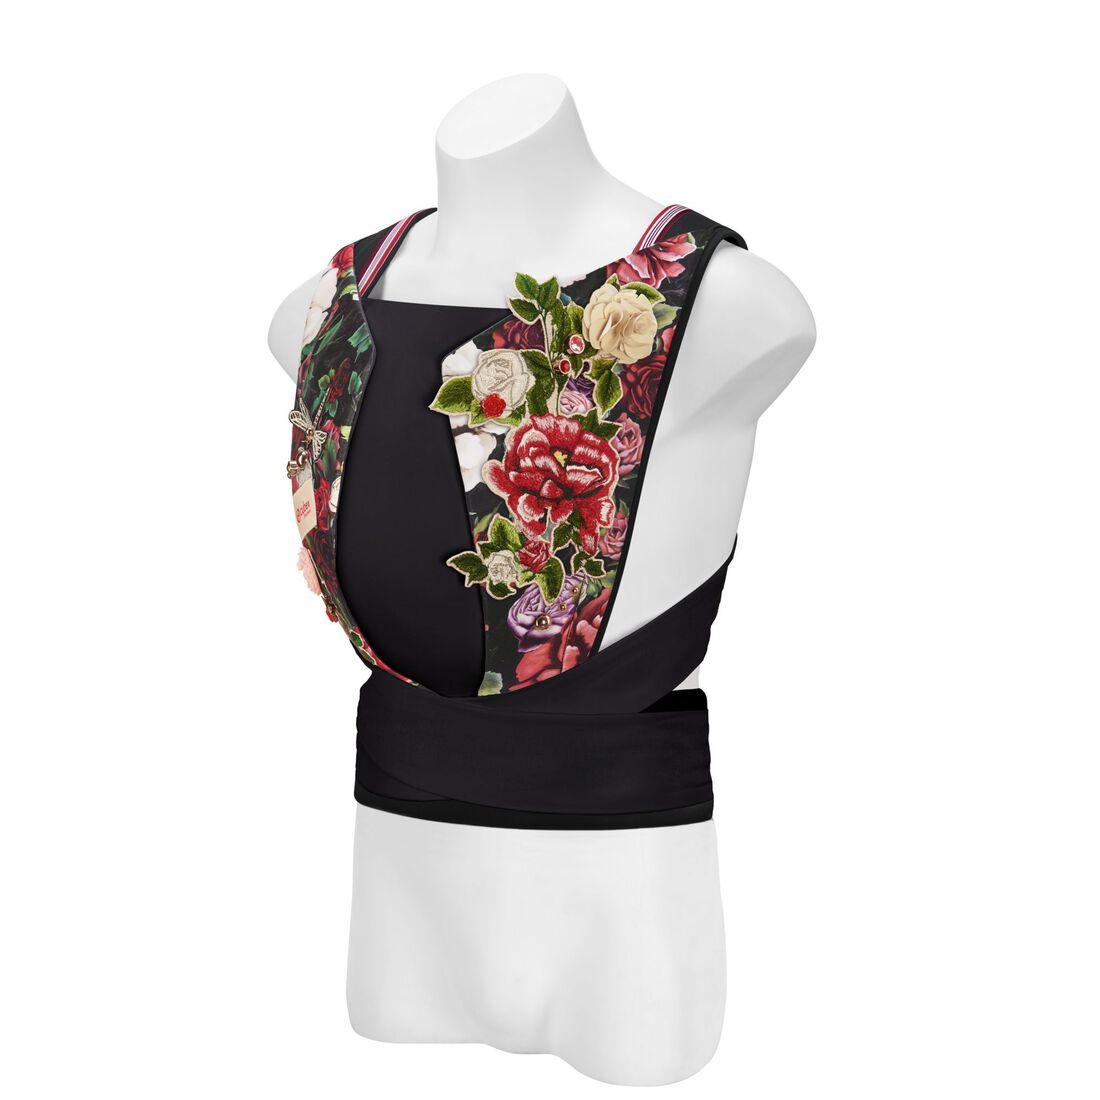 CYBEX Yema Tie - Spring Blossom Dark in Spring Blossom Dark large image number 2